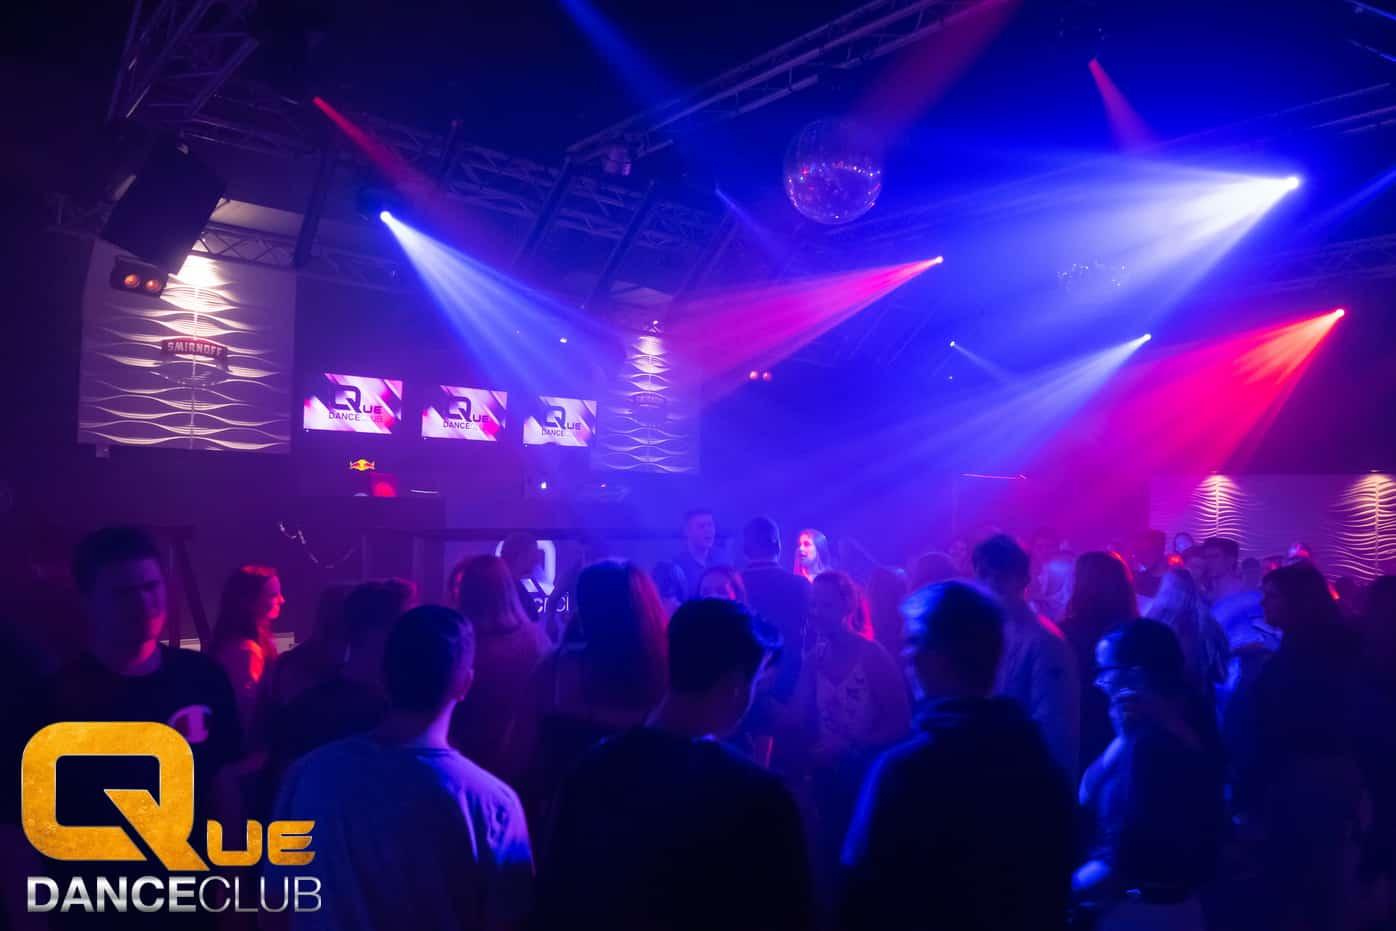 2018_12_20_Que_Danceclub_XMAS_Abiparty_United_Nightlife_Scene_Timo_010